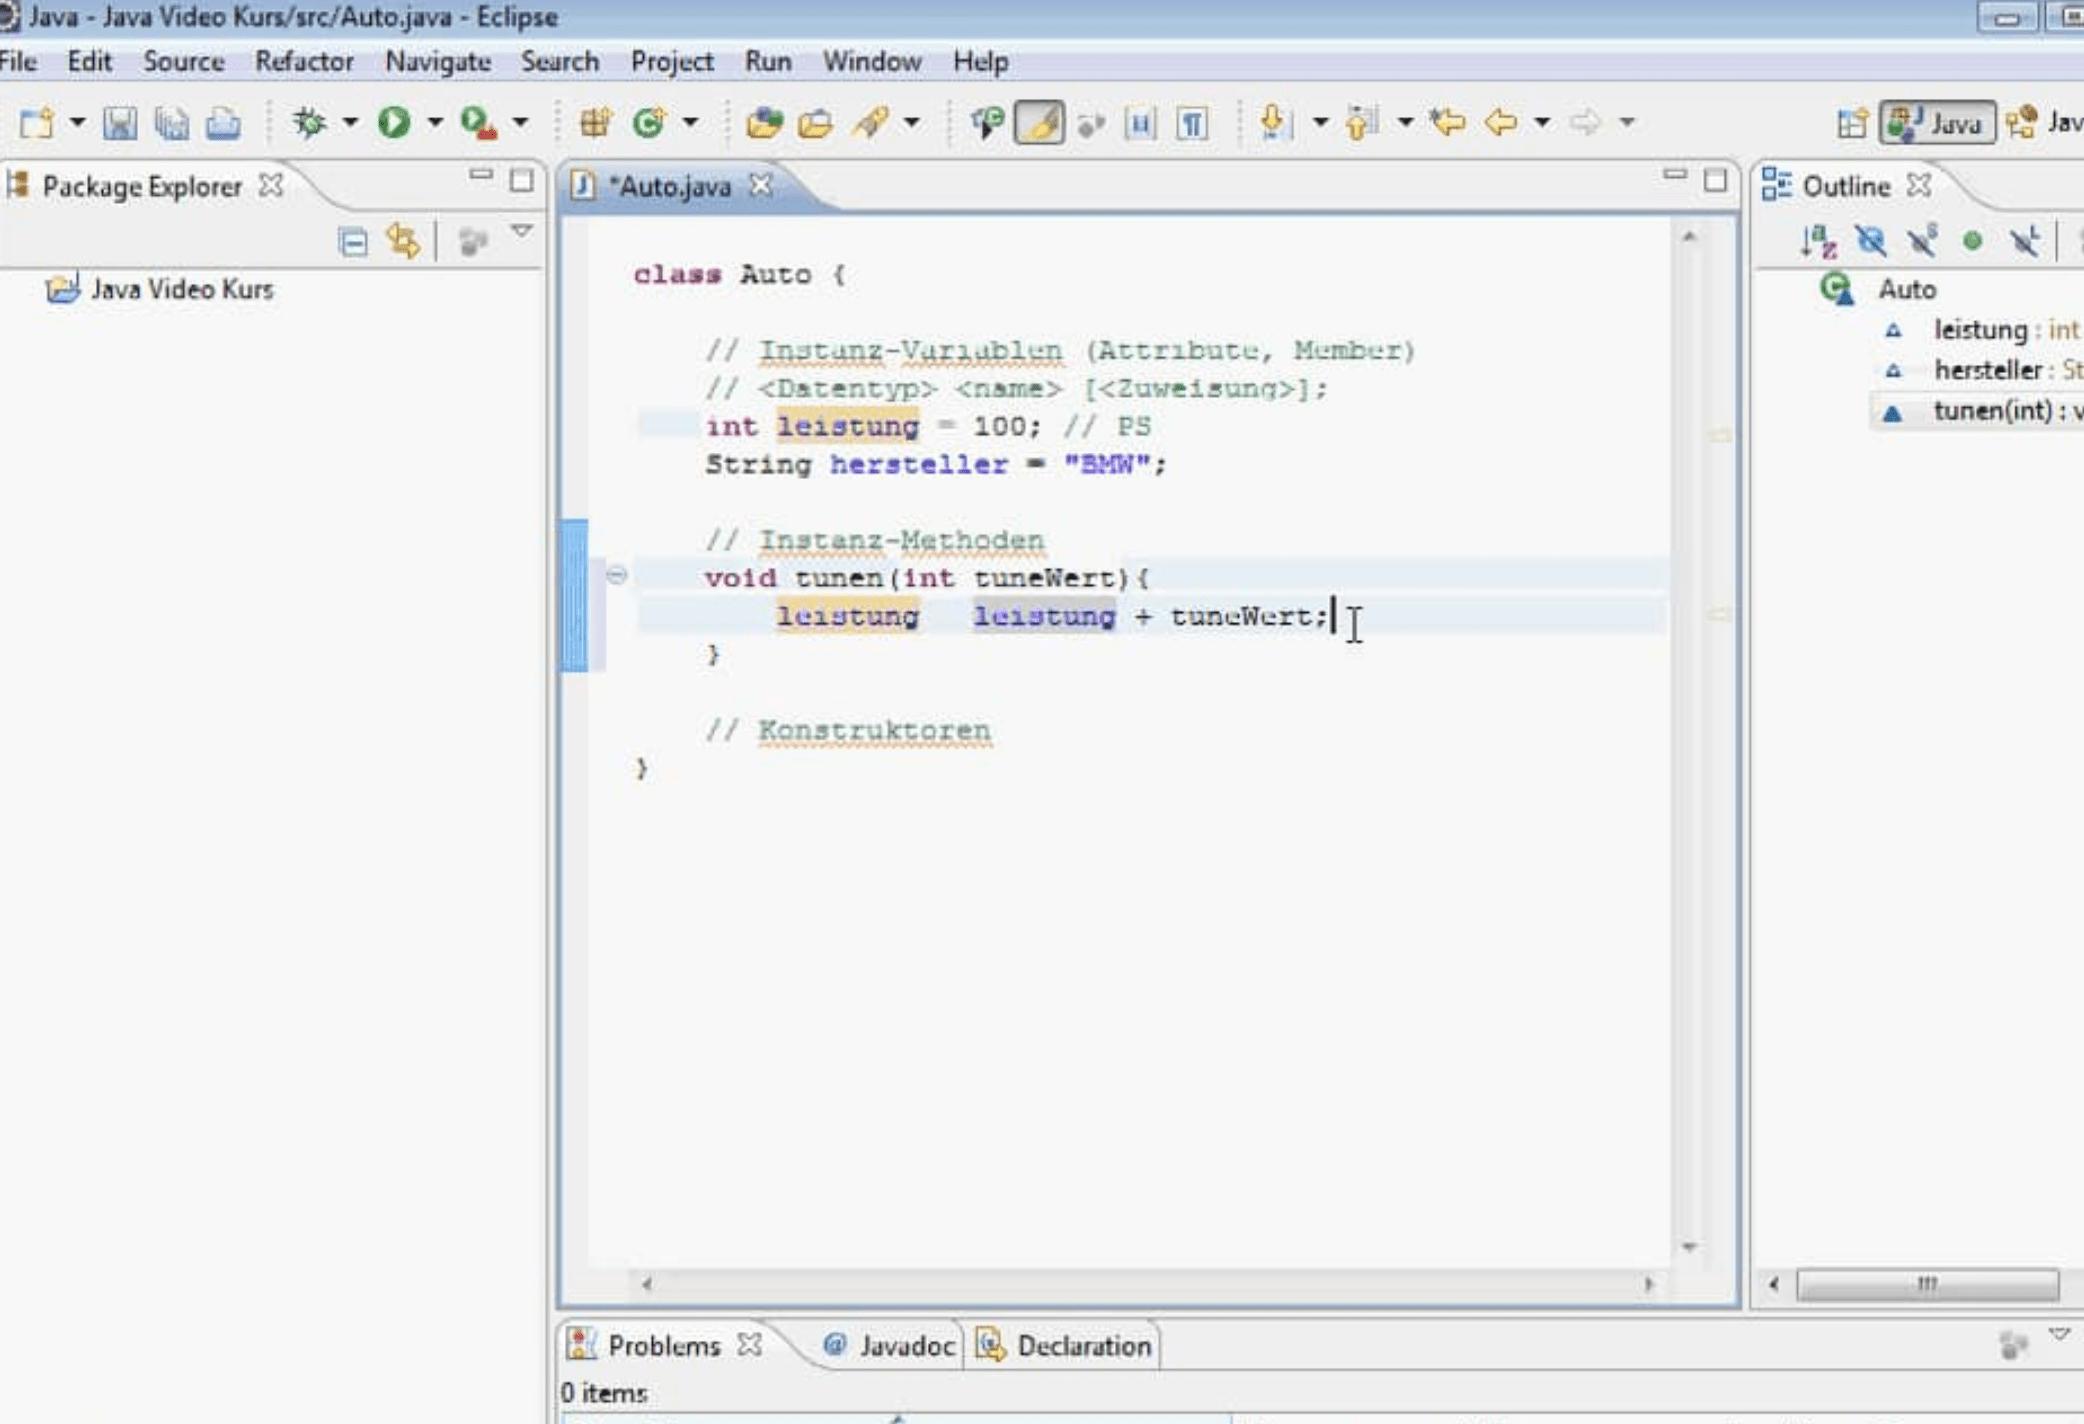 Java Instanzmethode